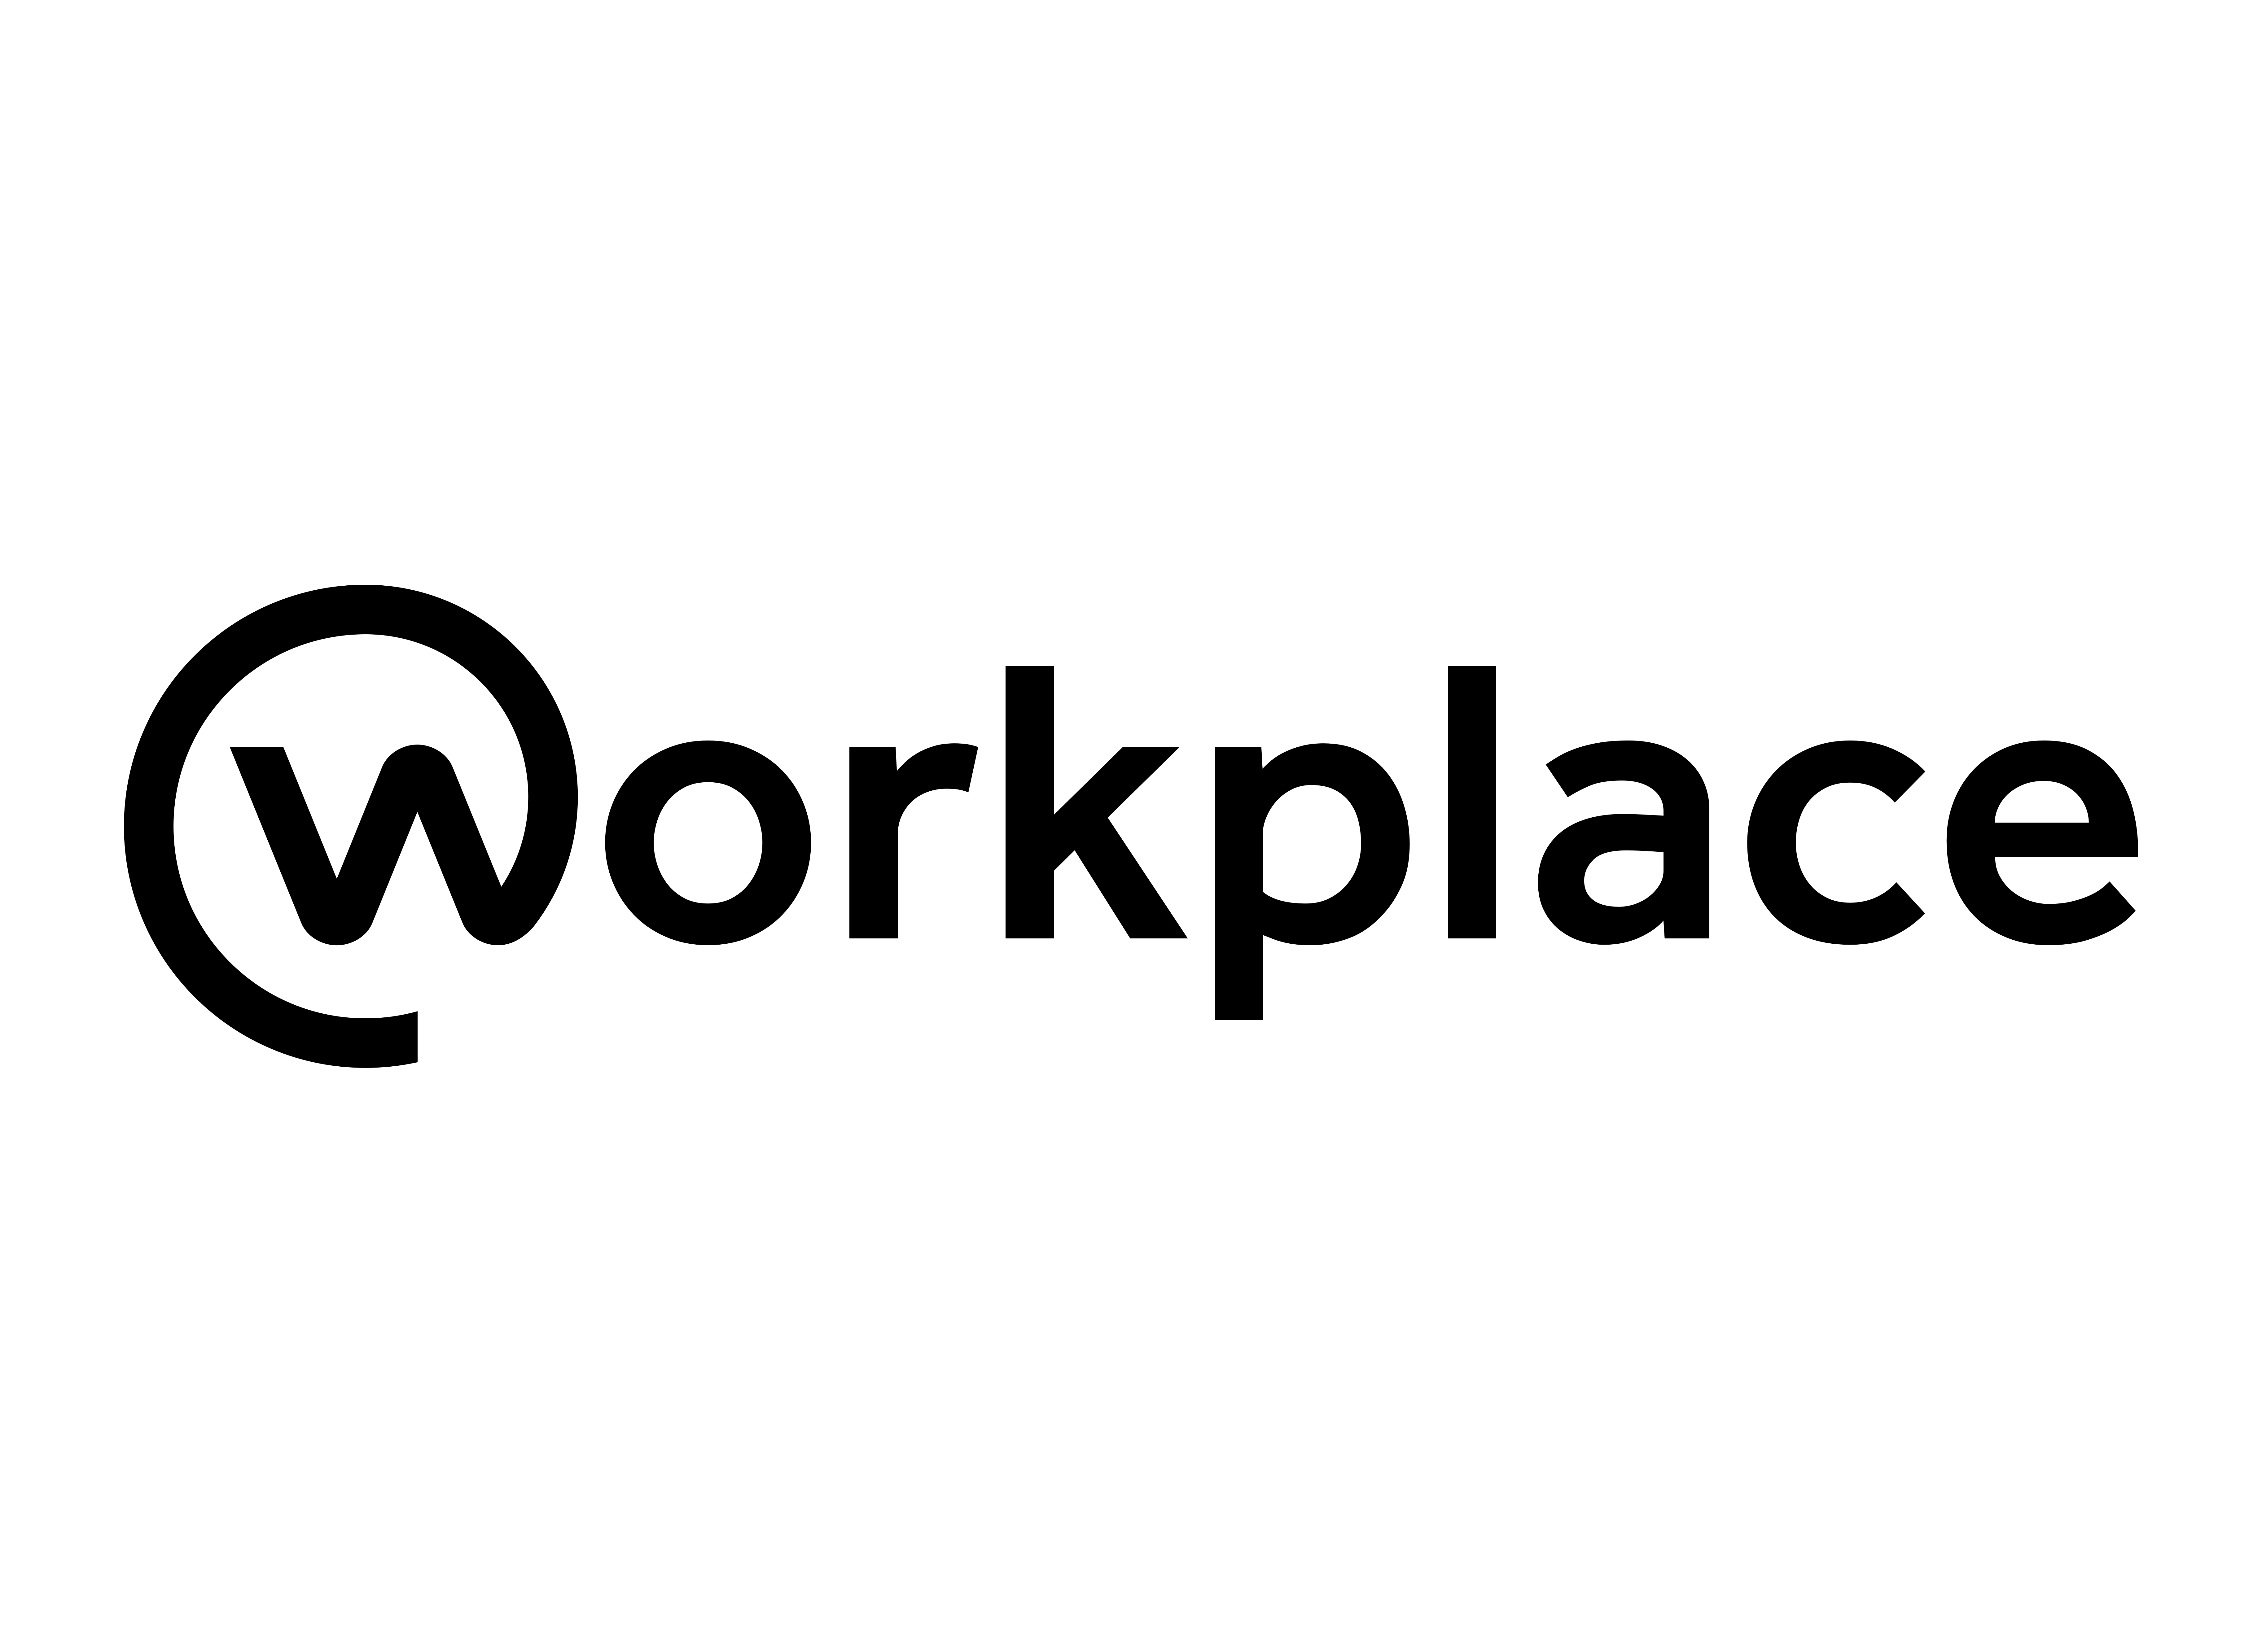 Facebook Workplace Logo.